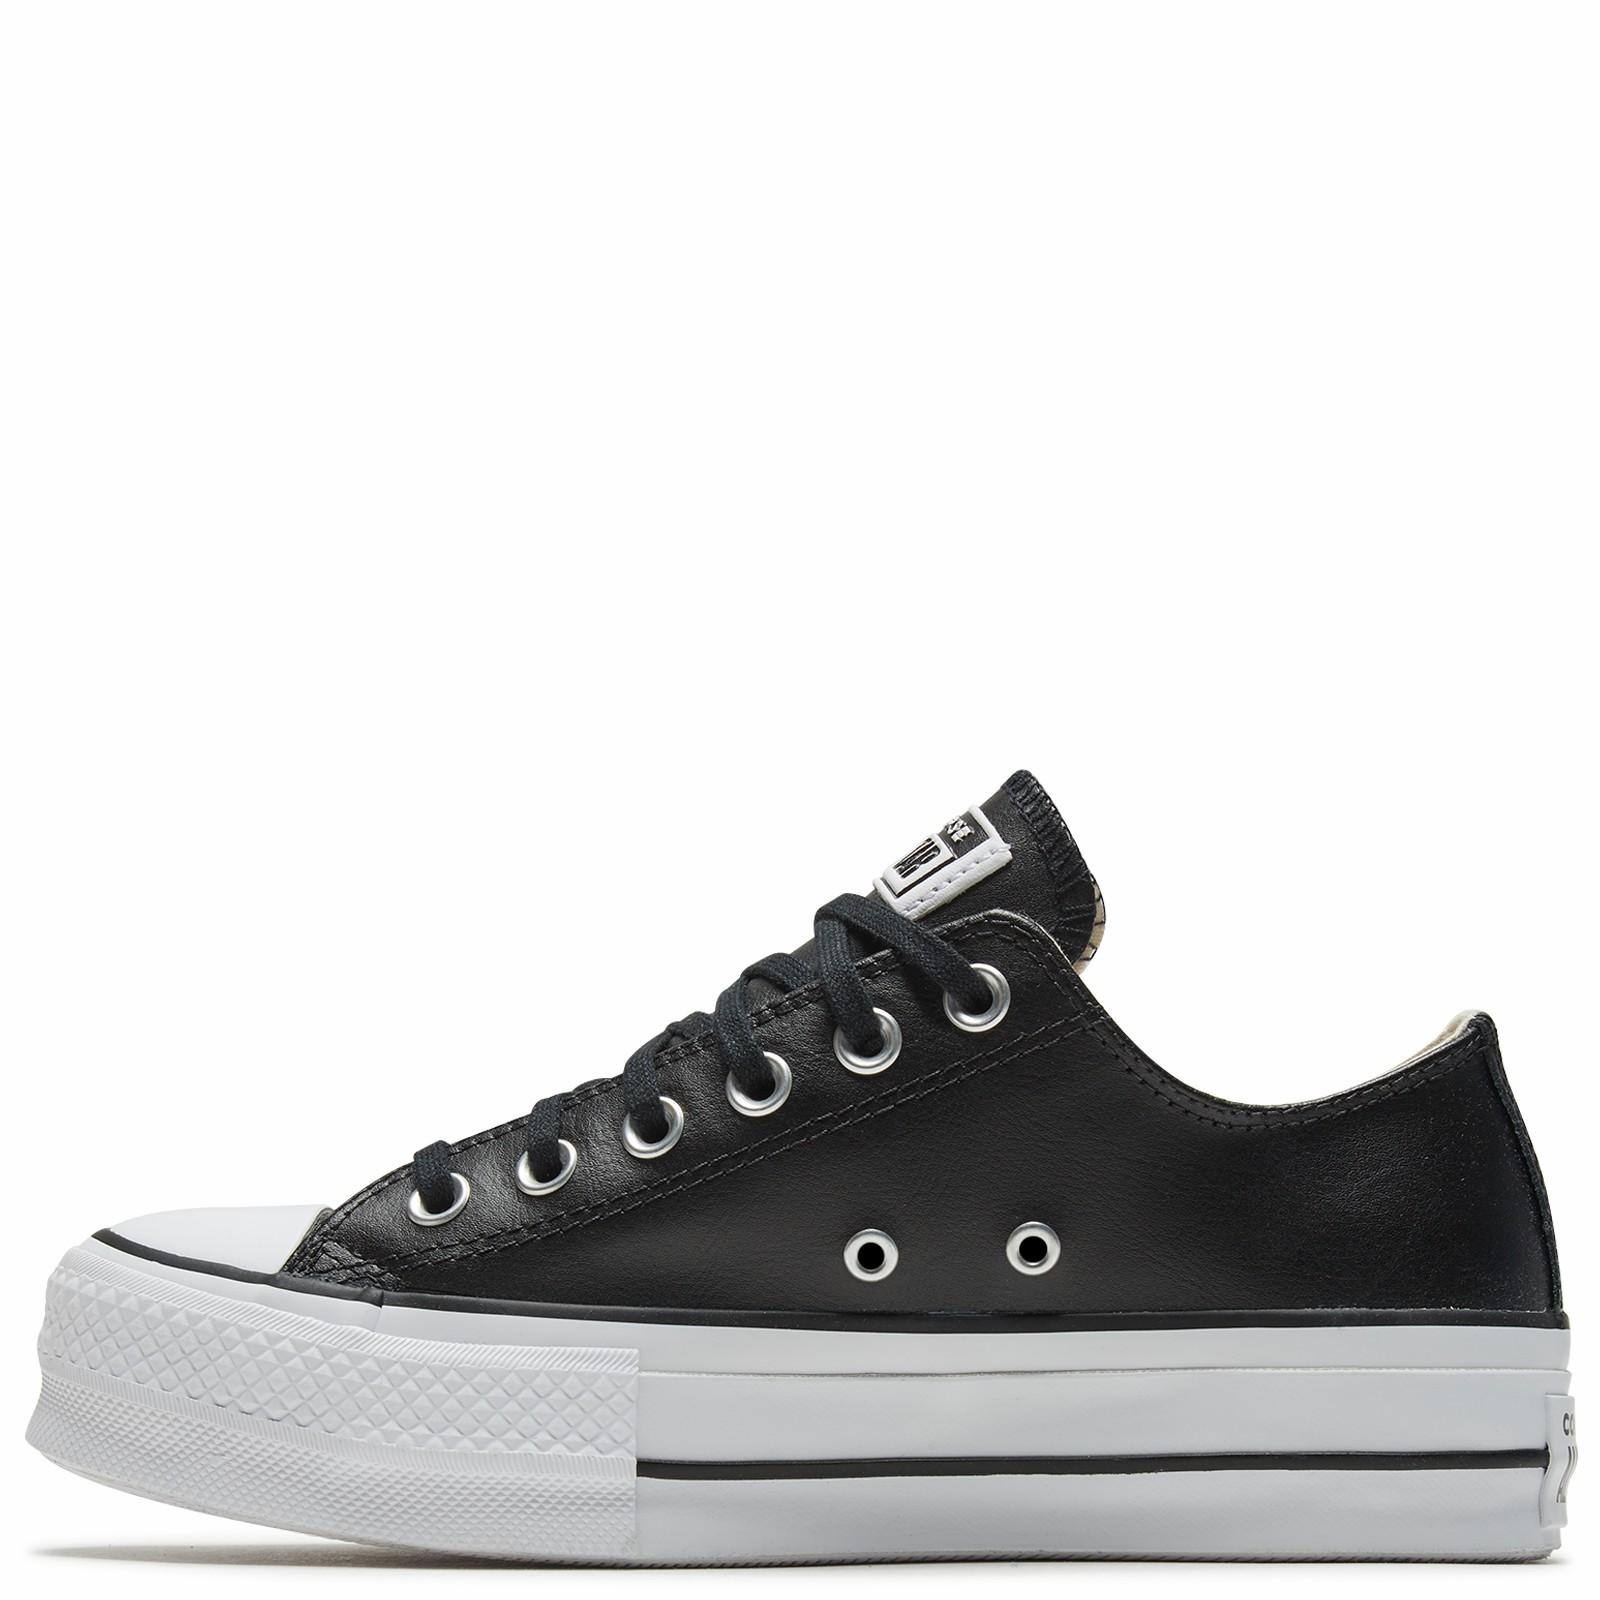 Cheap Converse Chuck